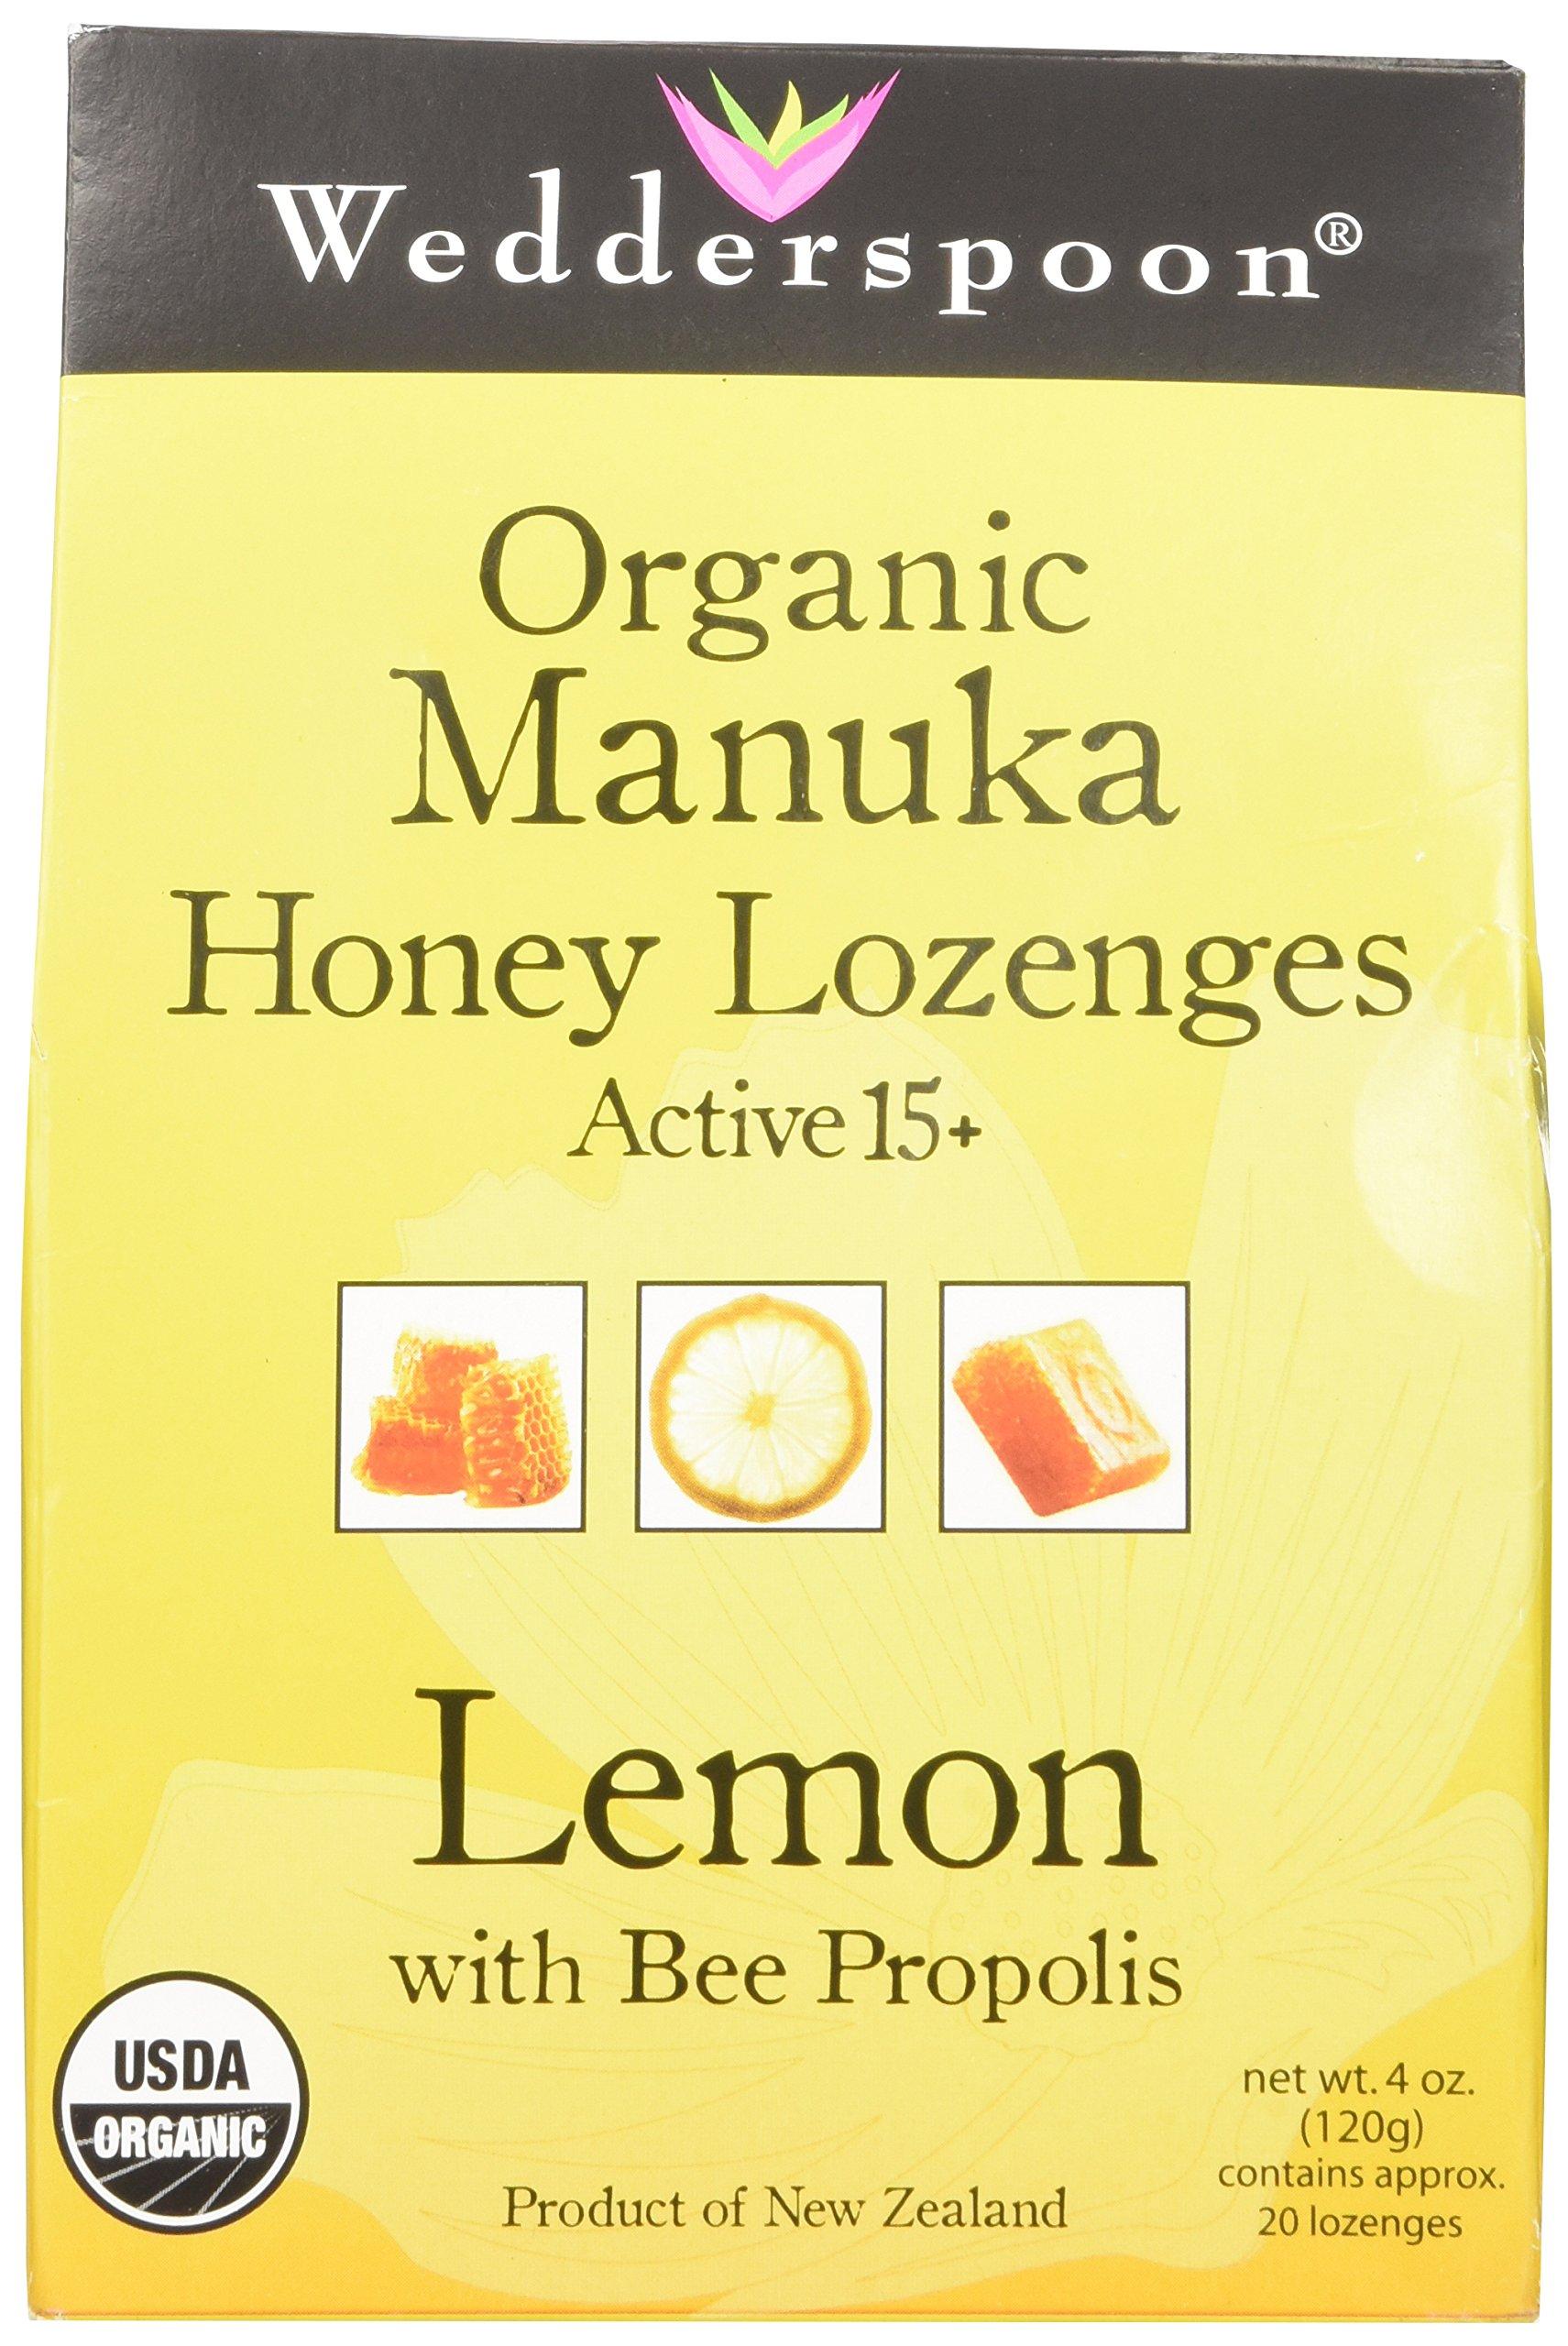 Wedderspoon Organic Manuka Honey Lozenges with Lemon and Bee Propolis, 4 Ounce